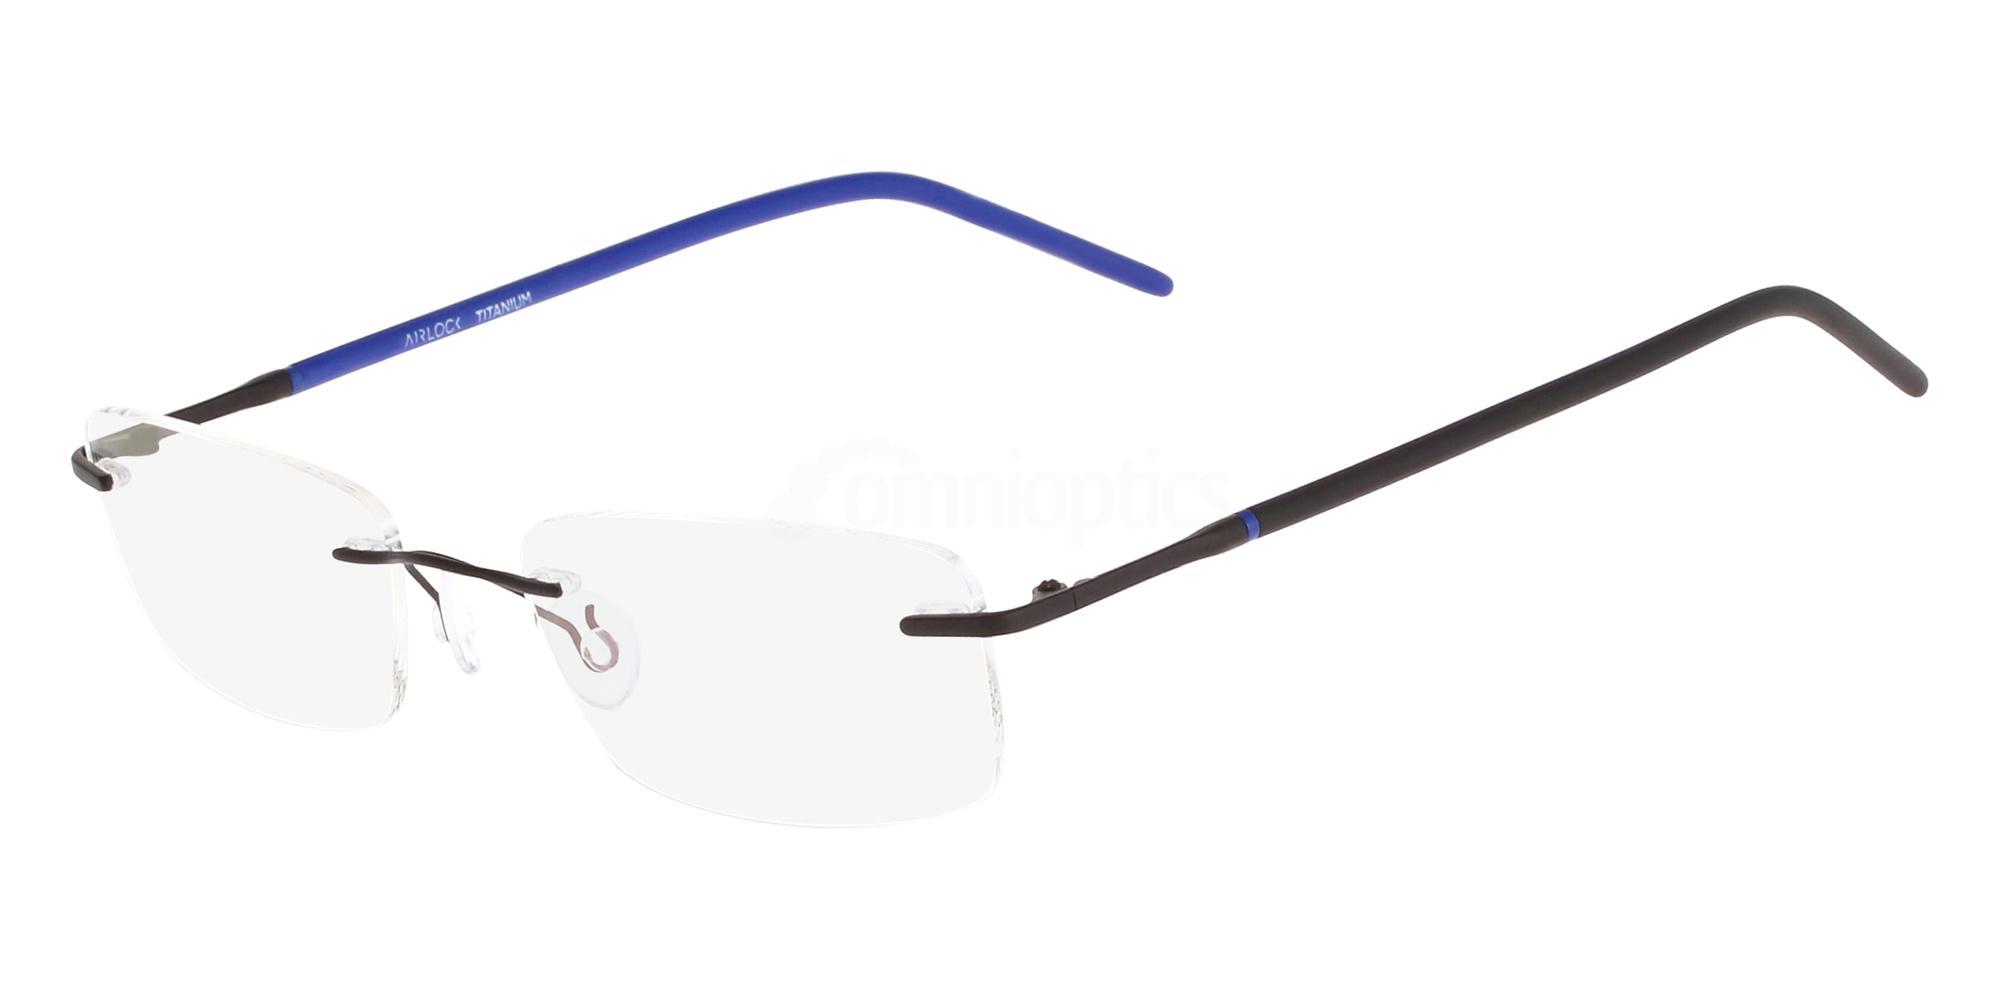 001 ENDLESS 200 Glasses, AIRLOCK